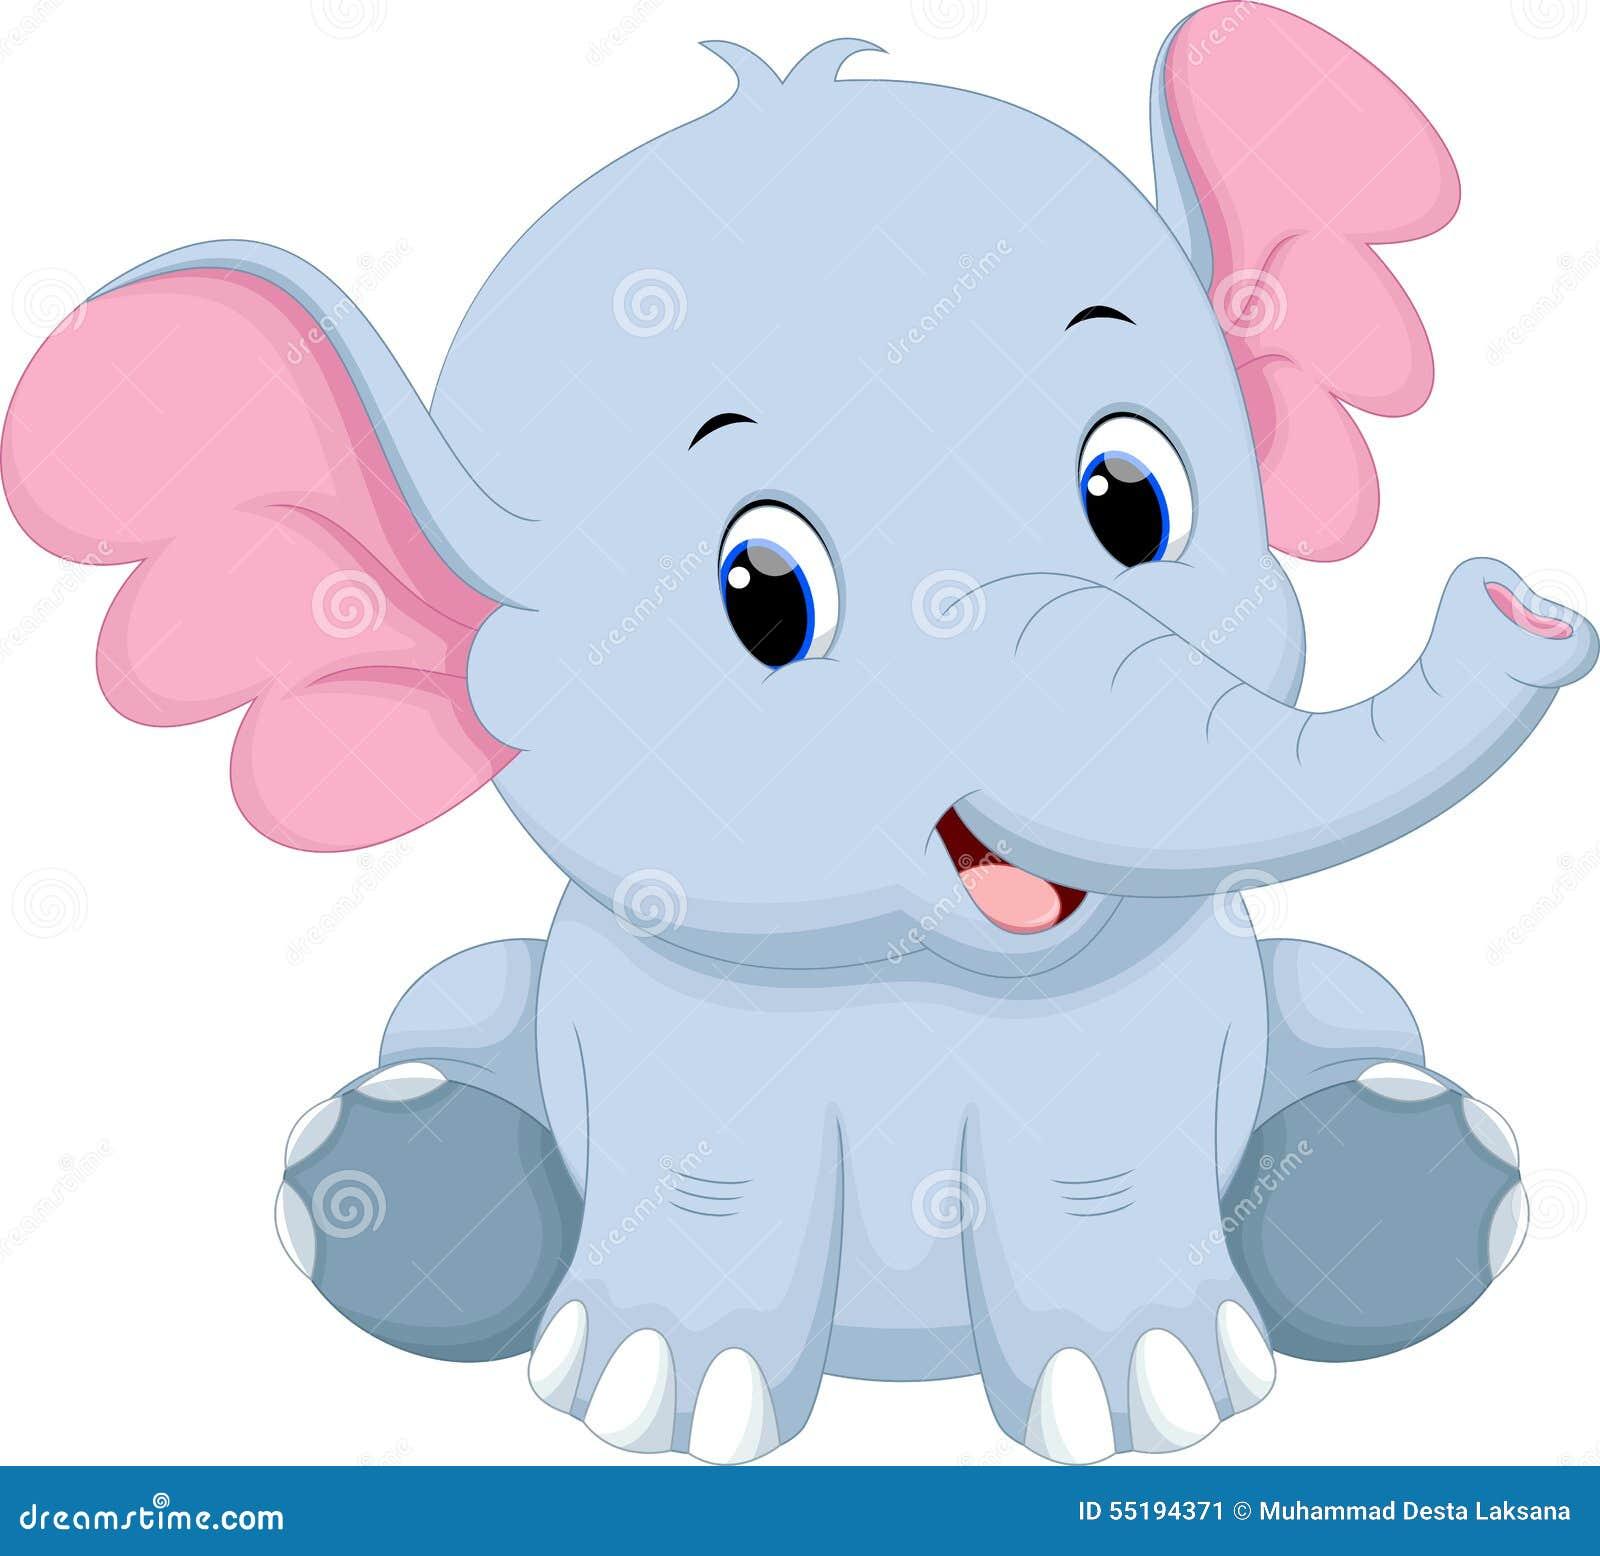 Download Wallpaper Cartoon Elephant - cute-baby-elephant-cartoon-white-background-55194371  Picture_503425  .jpg